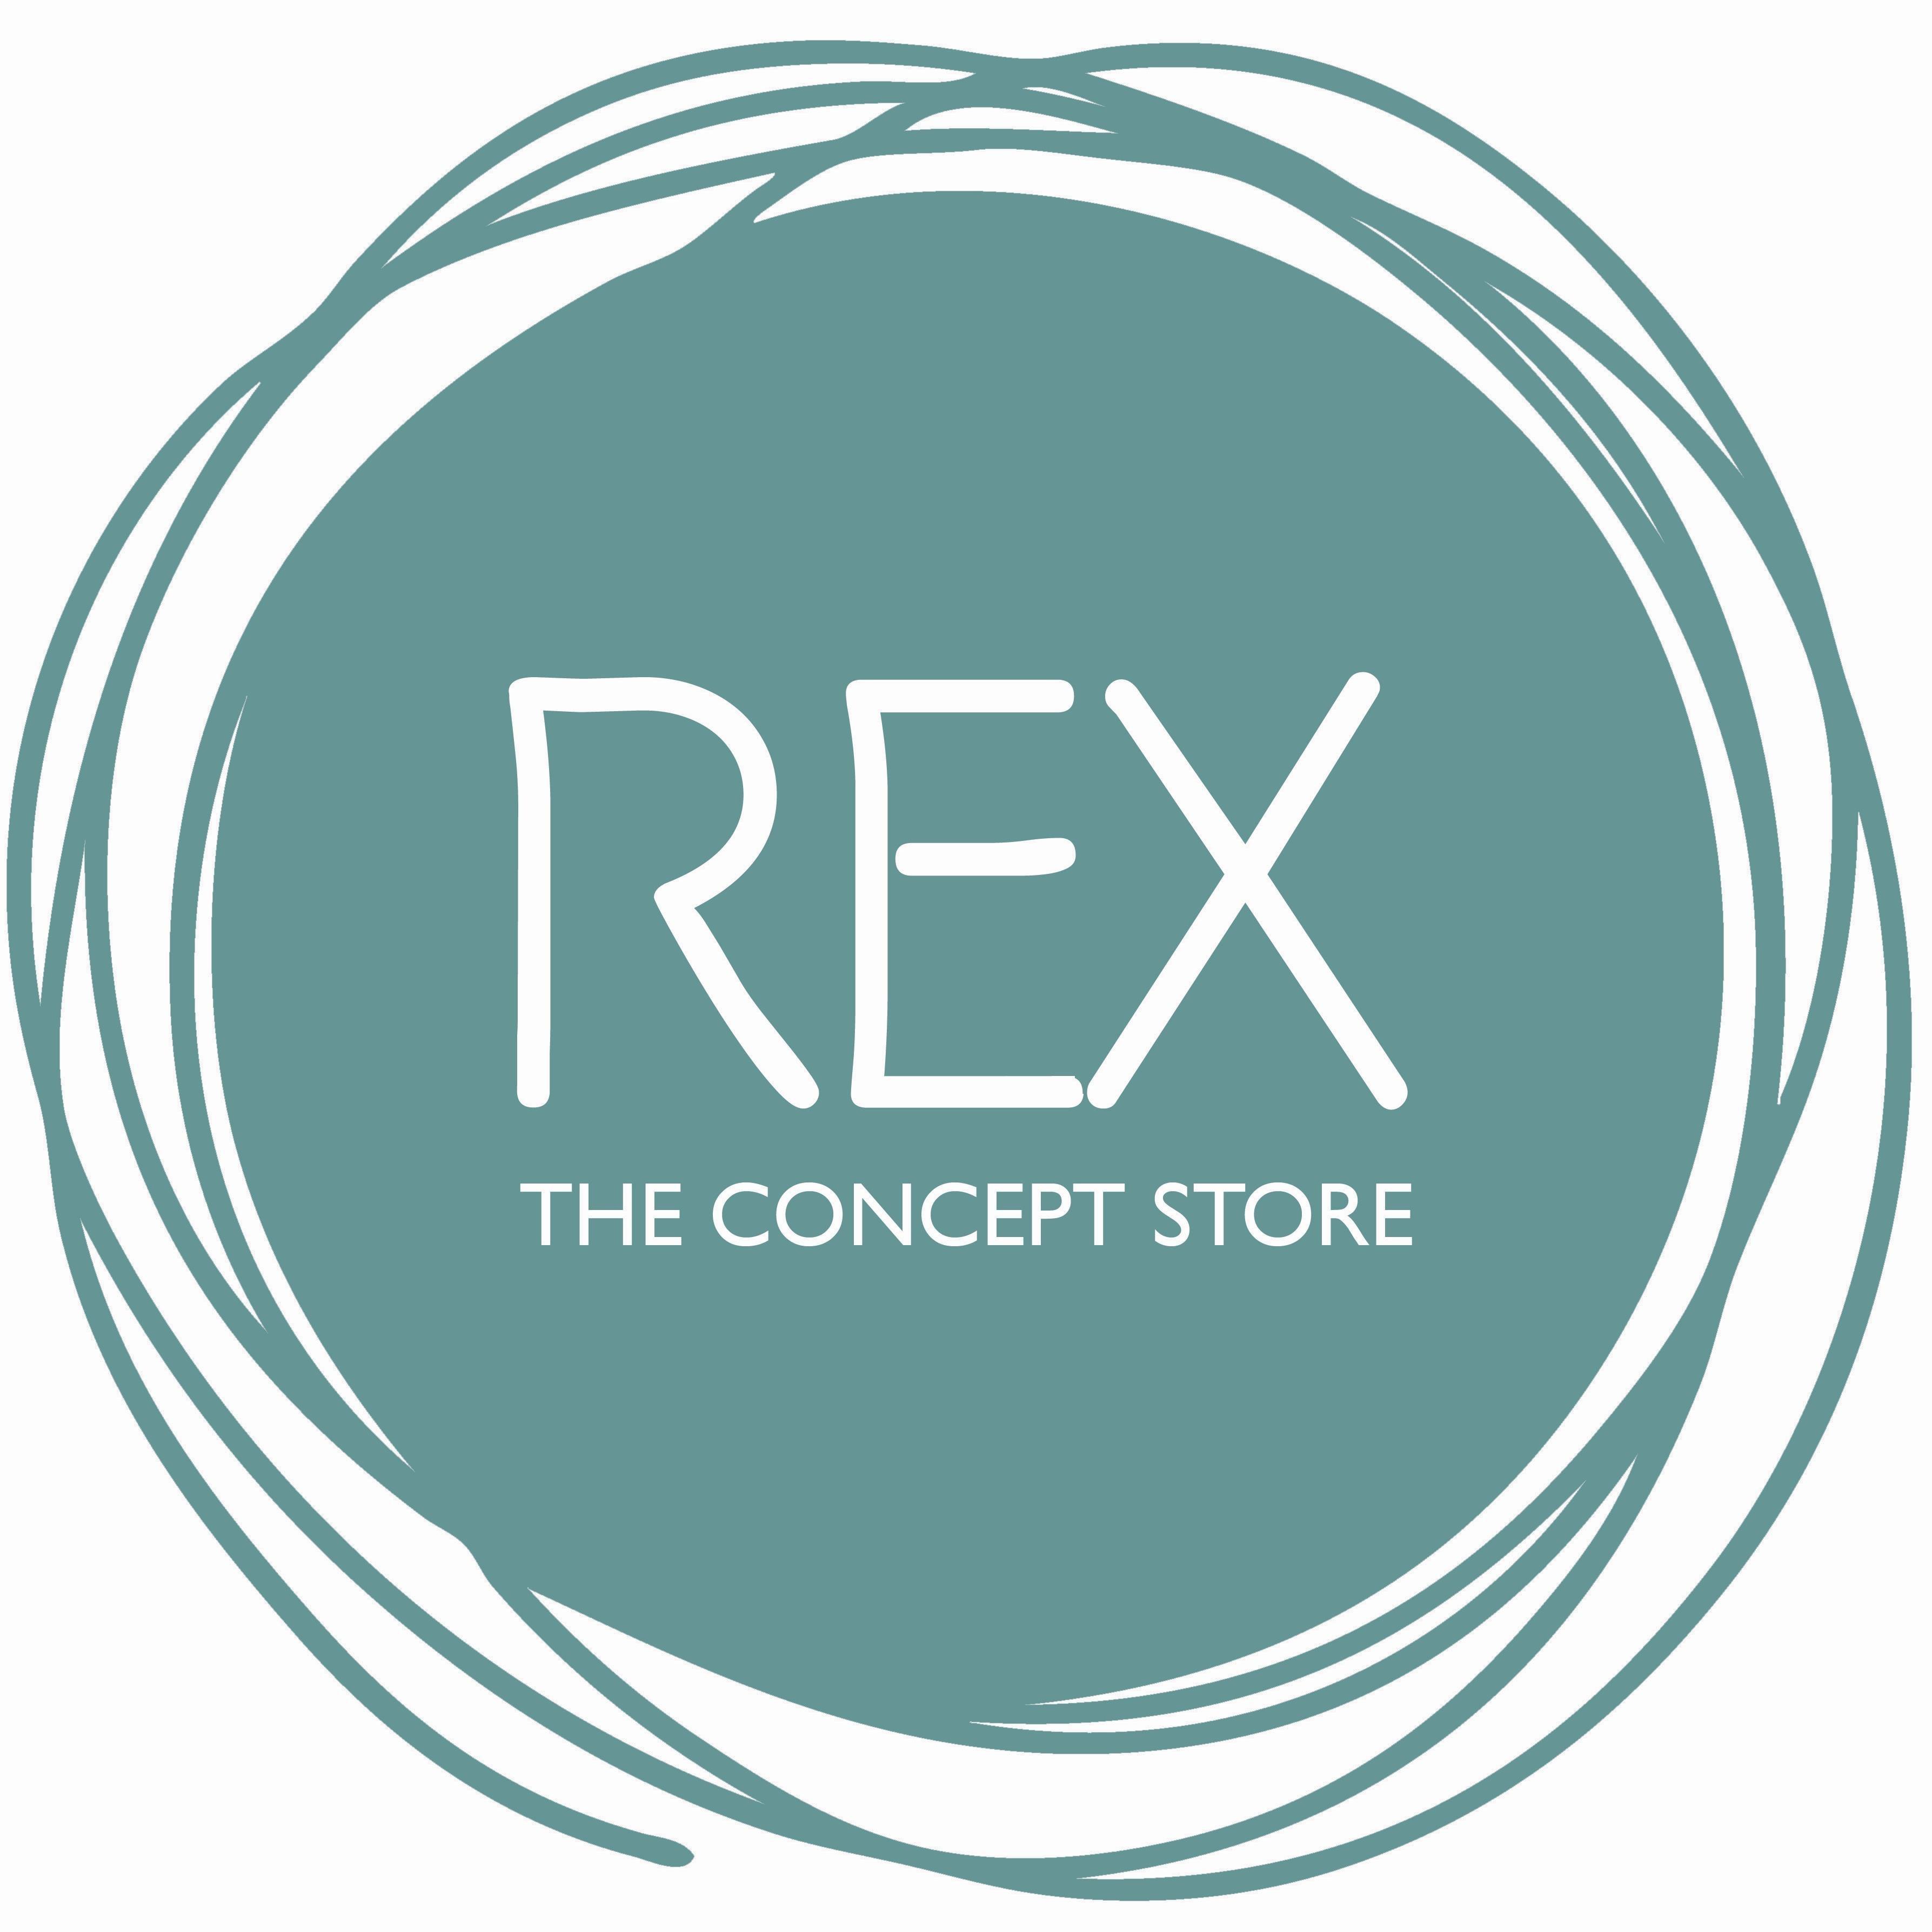 Rex Liverpool